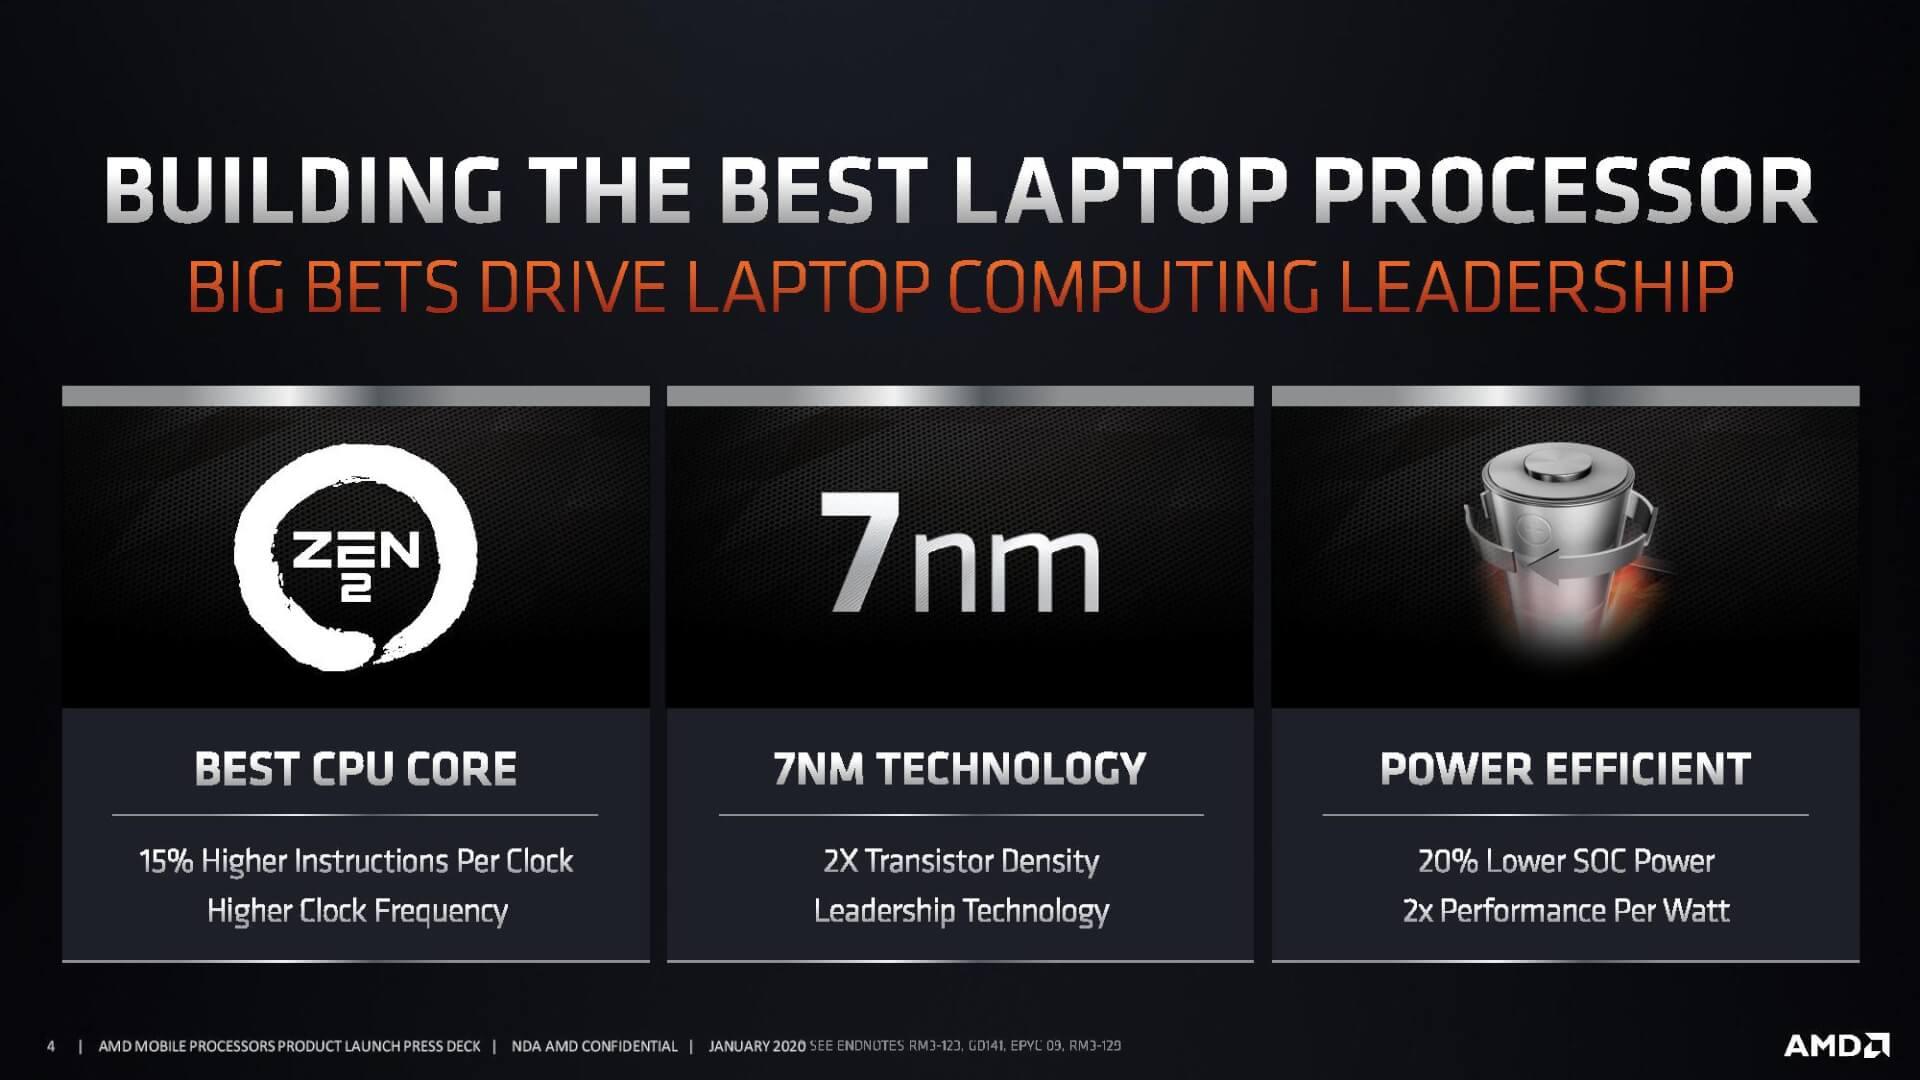 Amd Ryzen 5 4500u Nearly 15 Faster Than 10th Gen Intel Core I5 1035g1 In Benchmarks Hardware Times